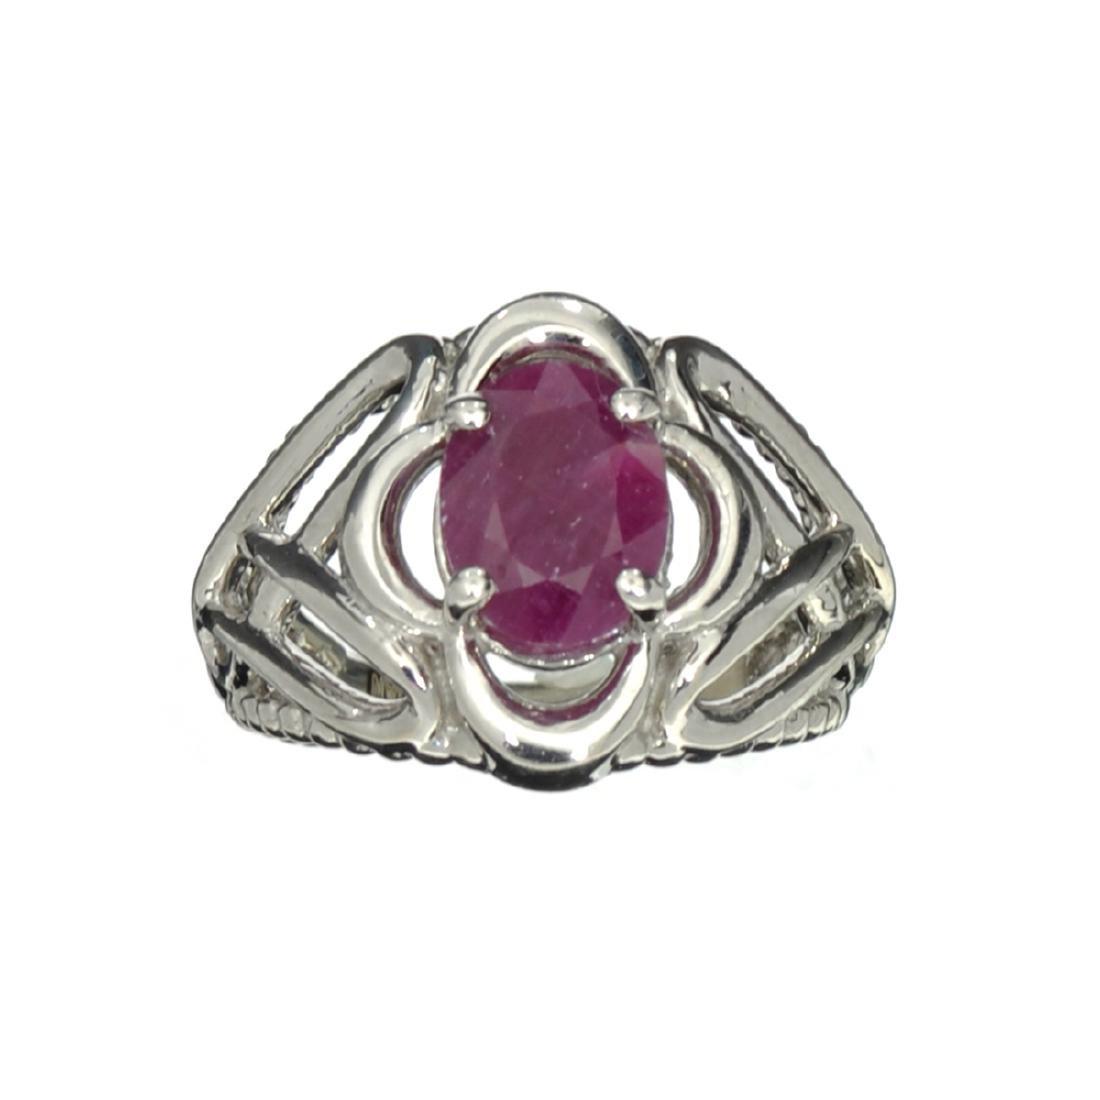 APP: 0.6k Fine Jewelry Designer Sebastian, 2.44CT Oval